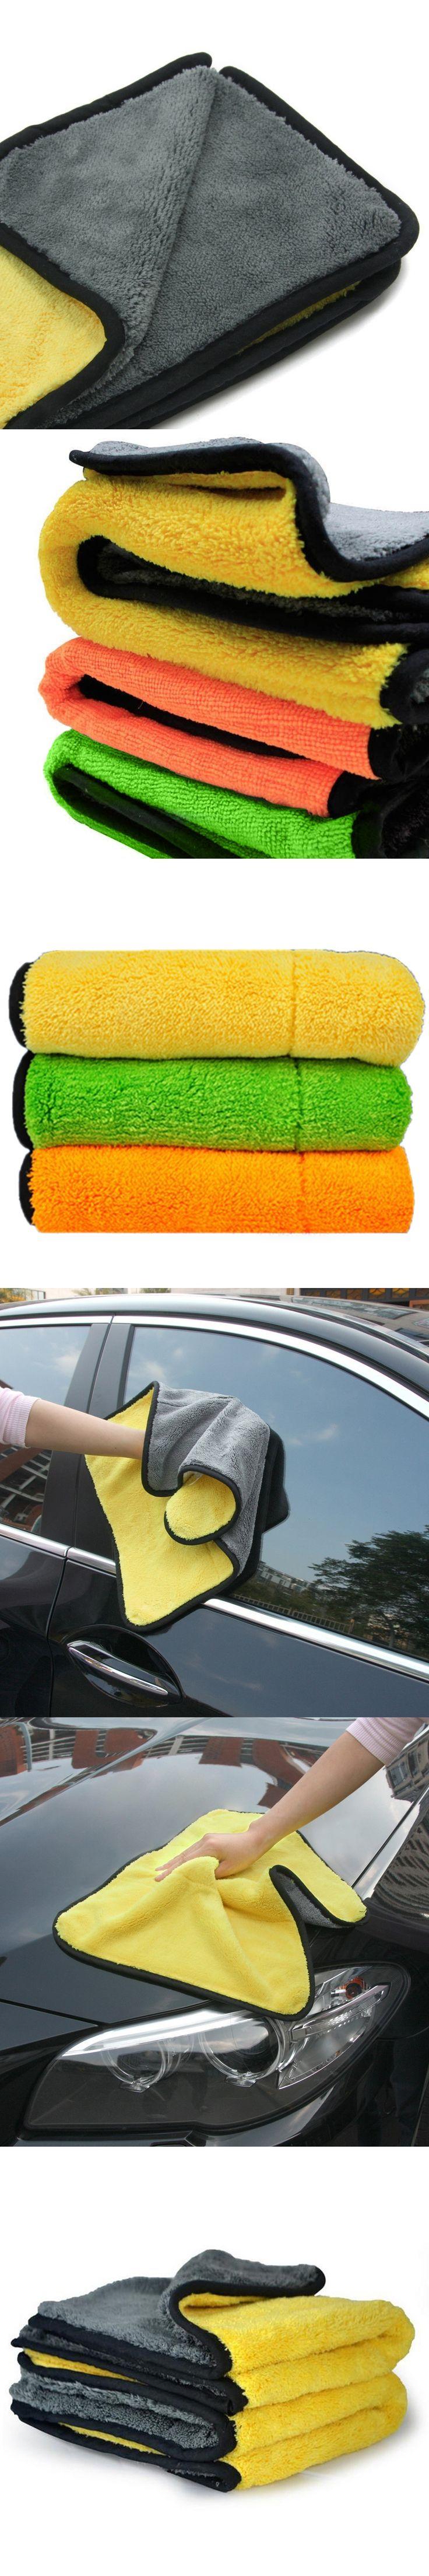 Super Thick Plush Microfiber Cleaning Cloth Car Care Wax Polish Detailing Towel